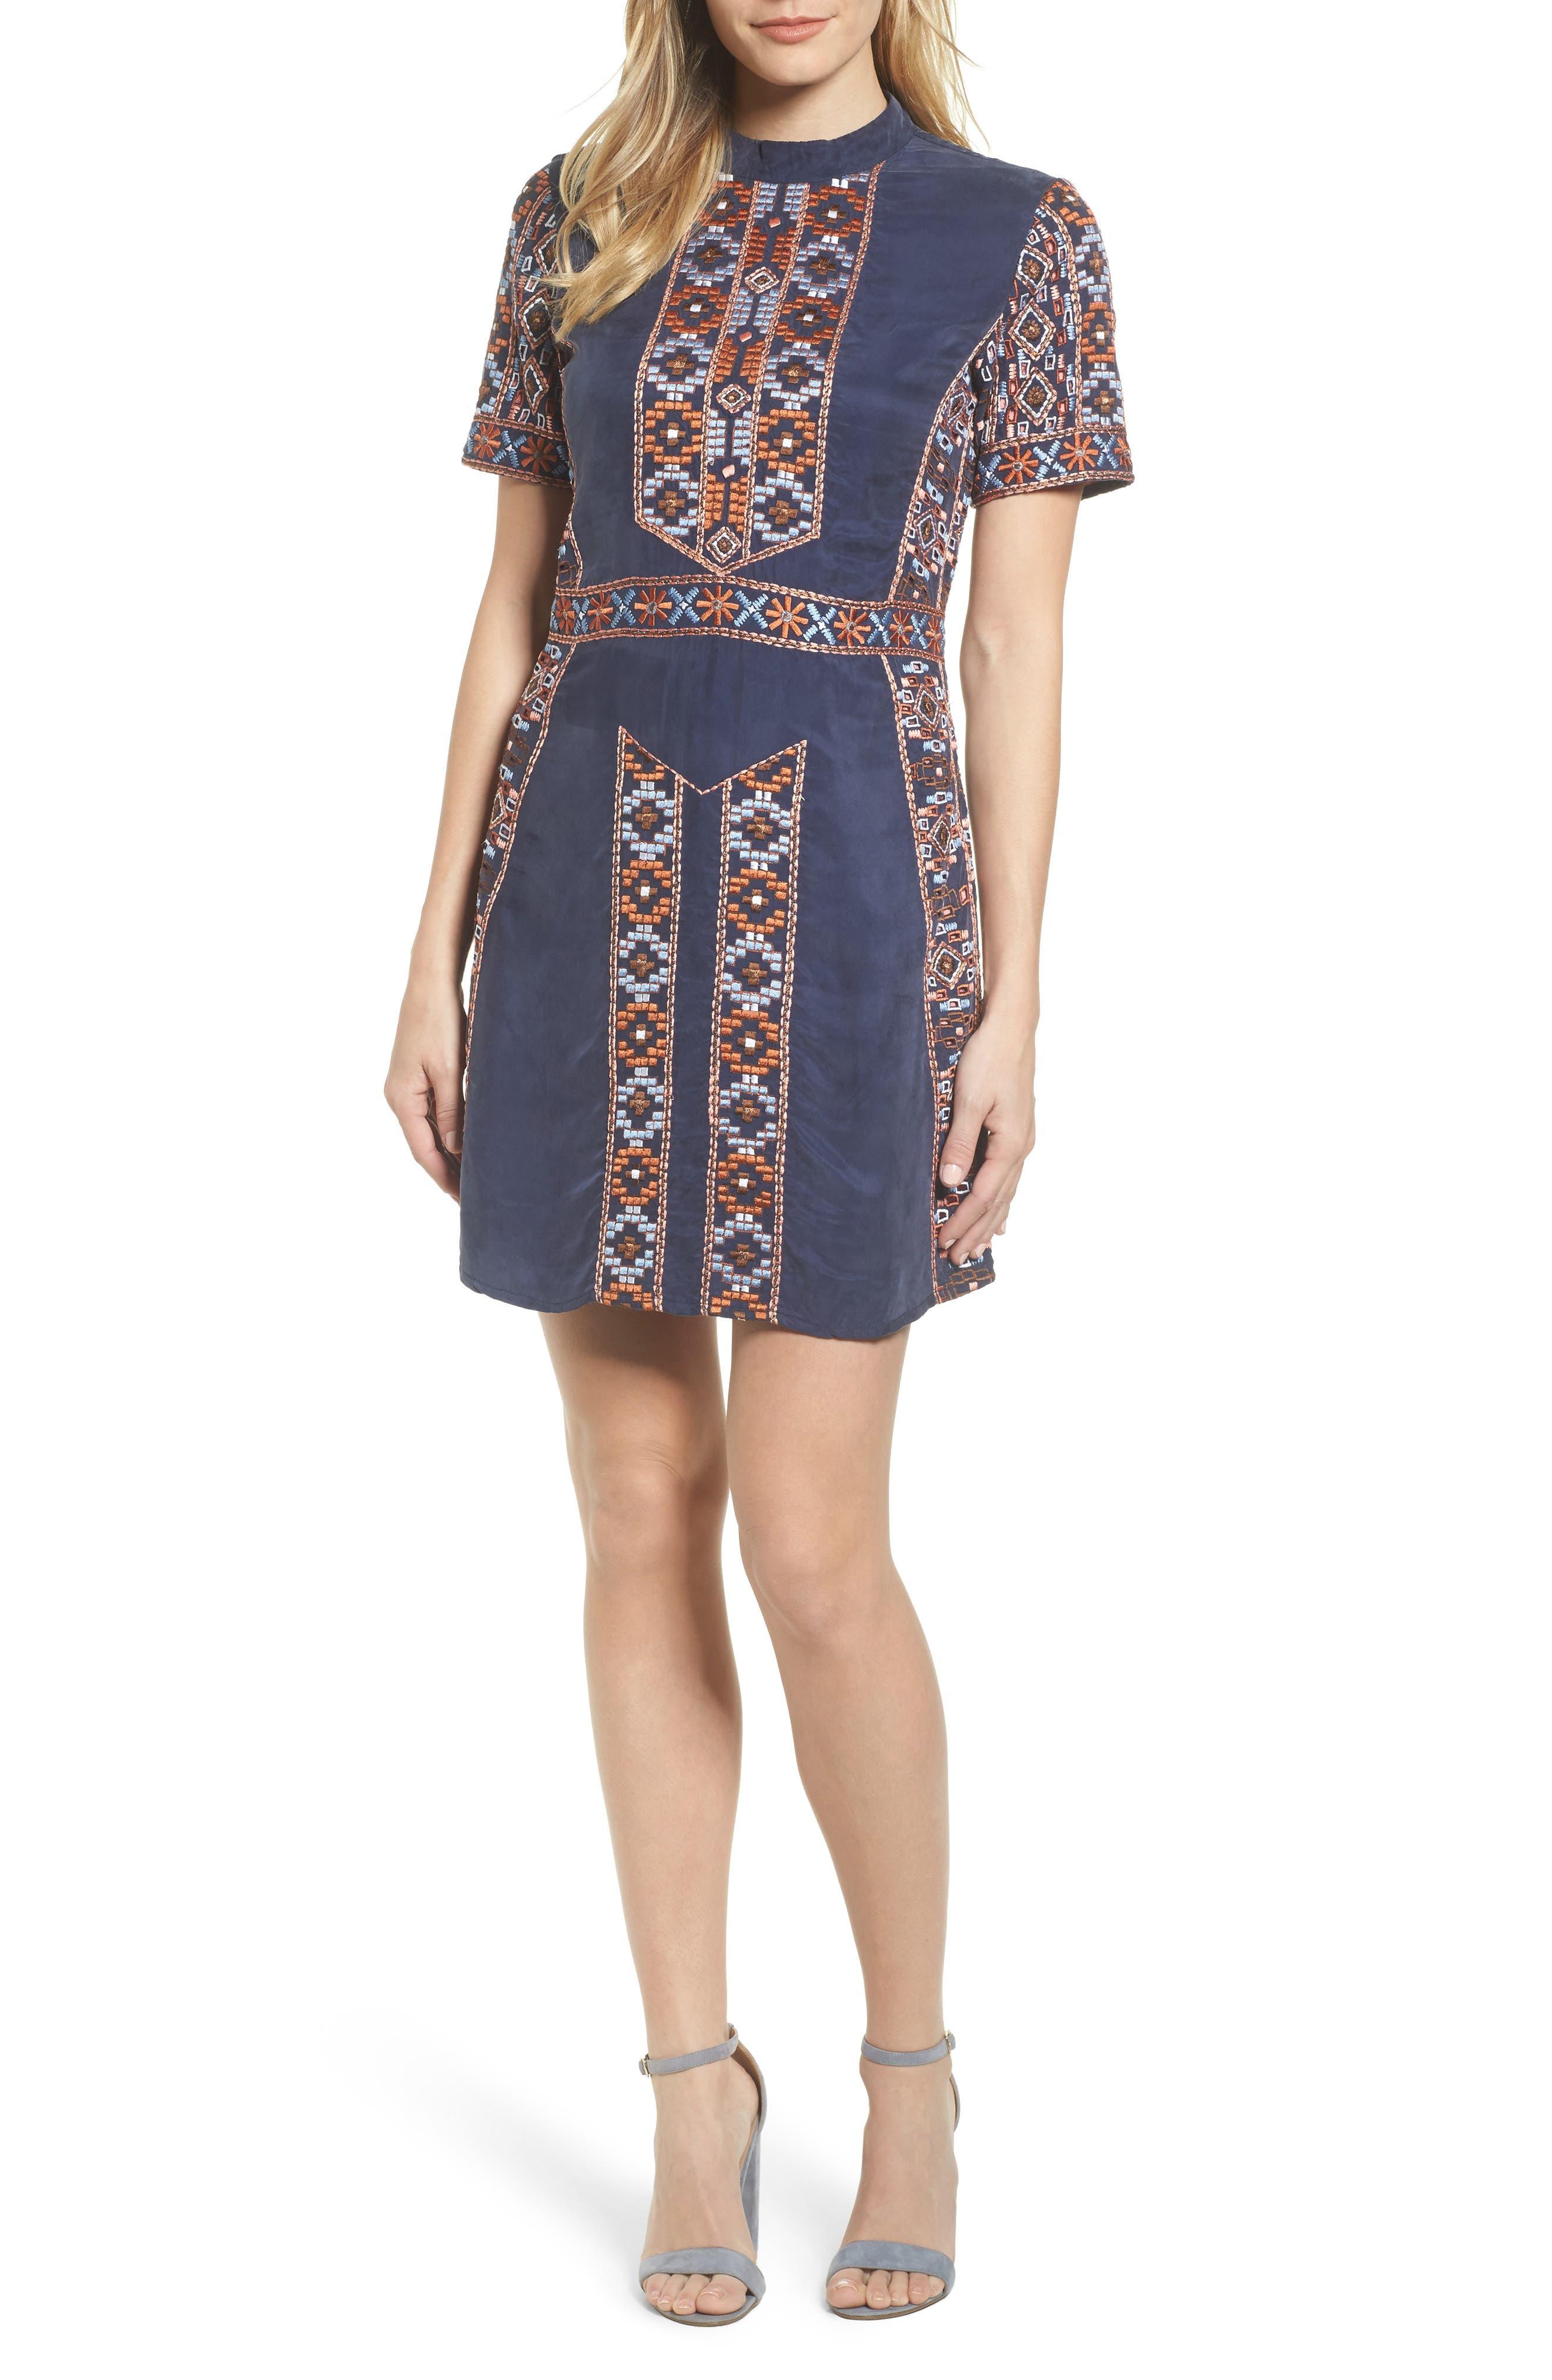 Main Image - KAS NEW YORK Luton Embroidered A-Line Dress